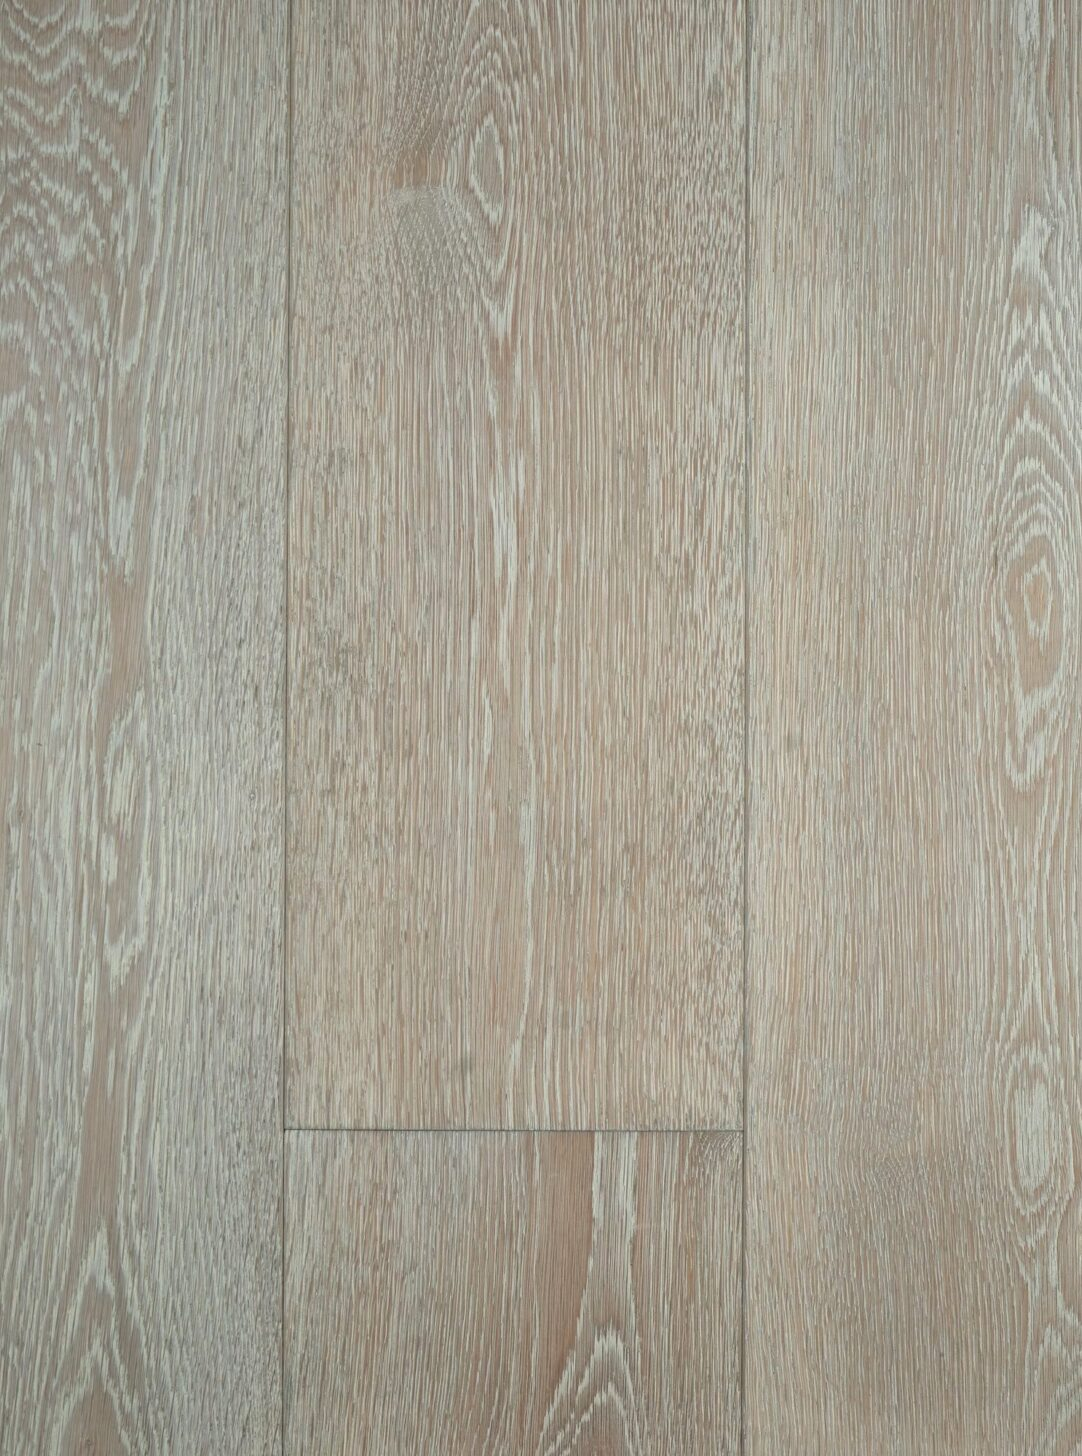 Grey oak flooring Landmark Tyntesfield